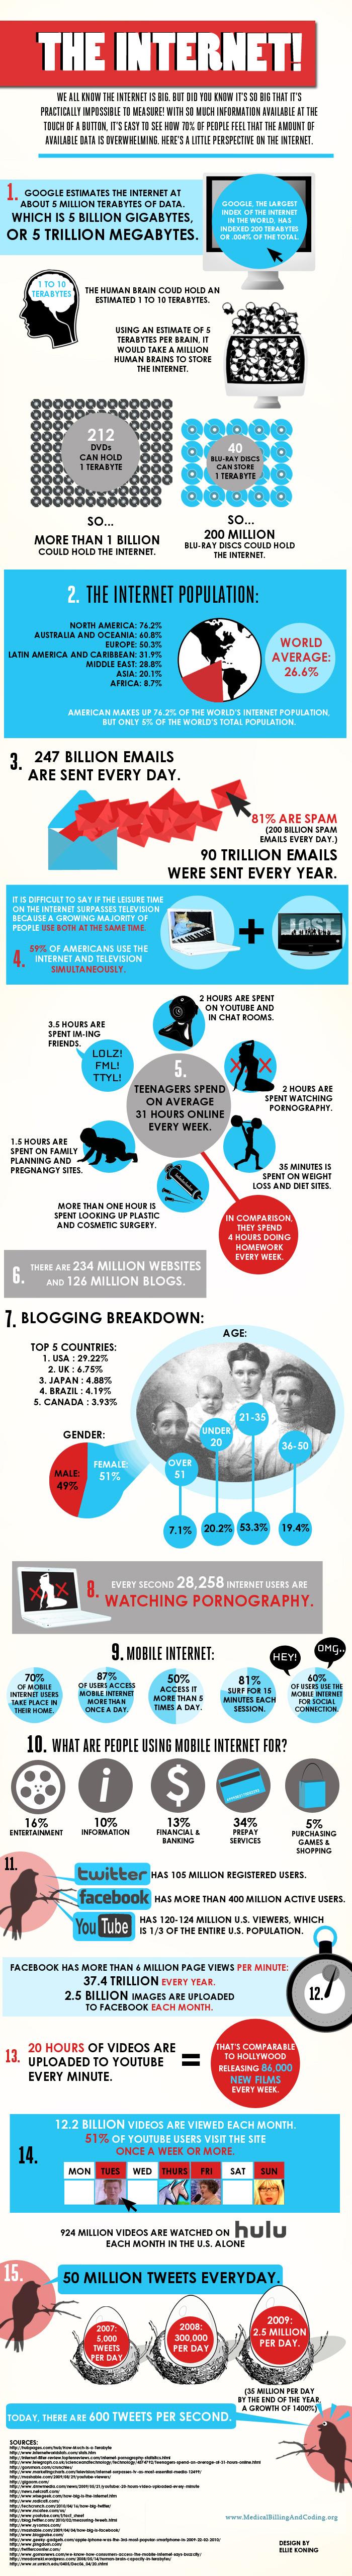 15 curiosidades sobre a internet